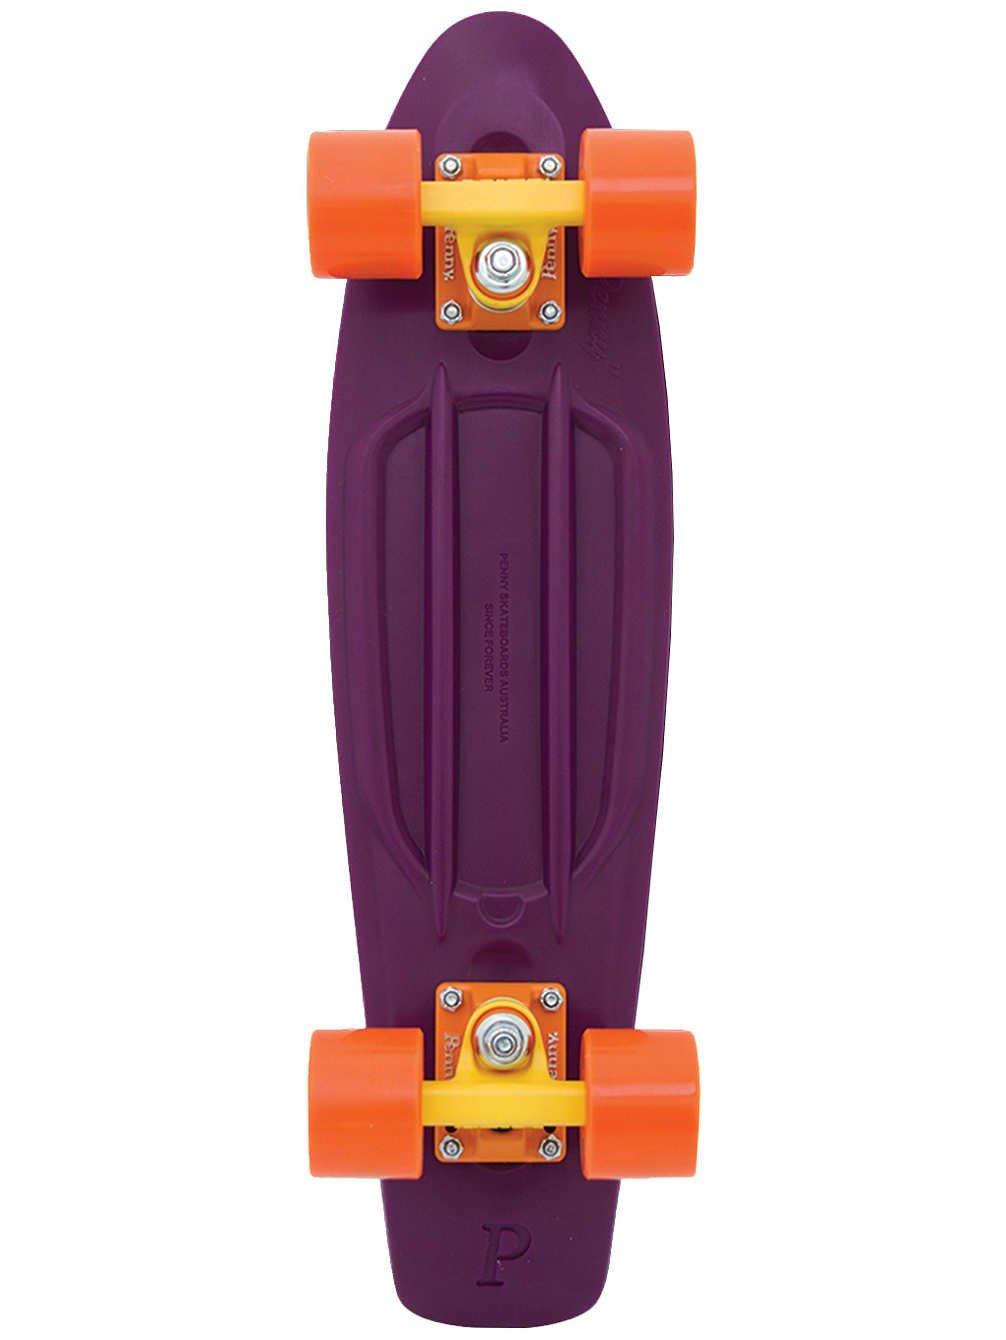 Penny Original Complete Skateboard, Sundown, 22'' L by Penny Australia